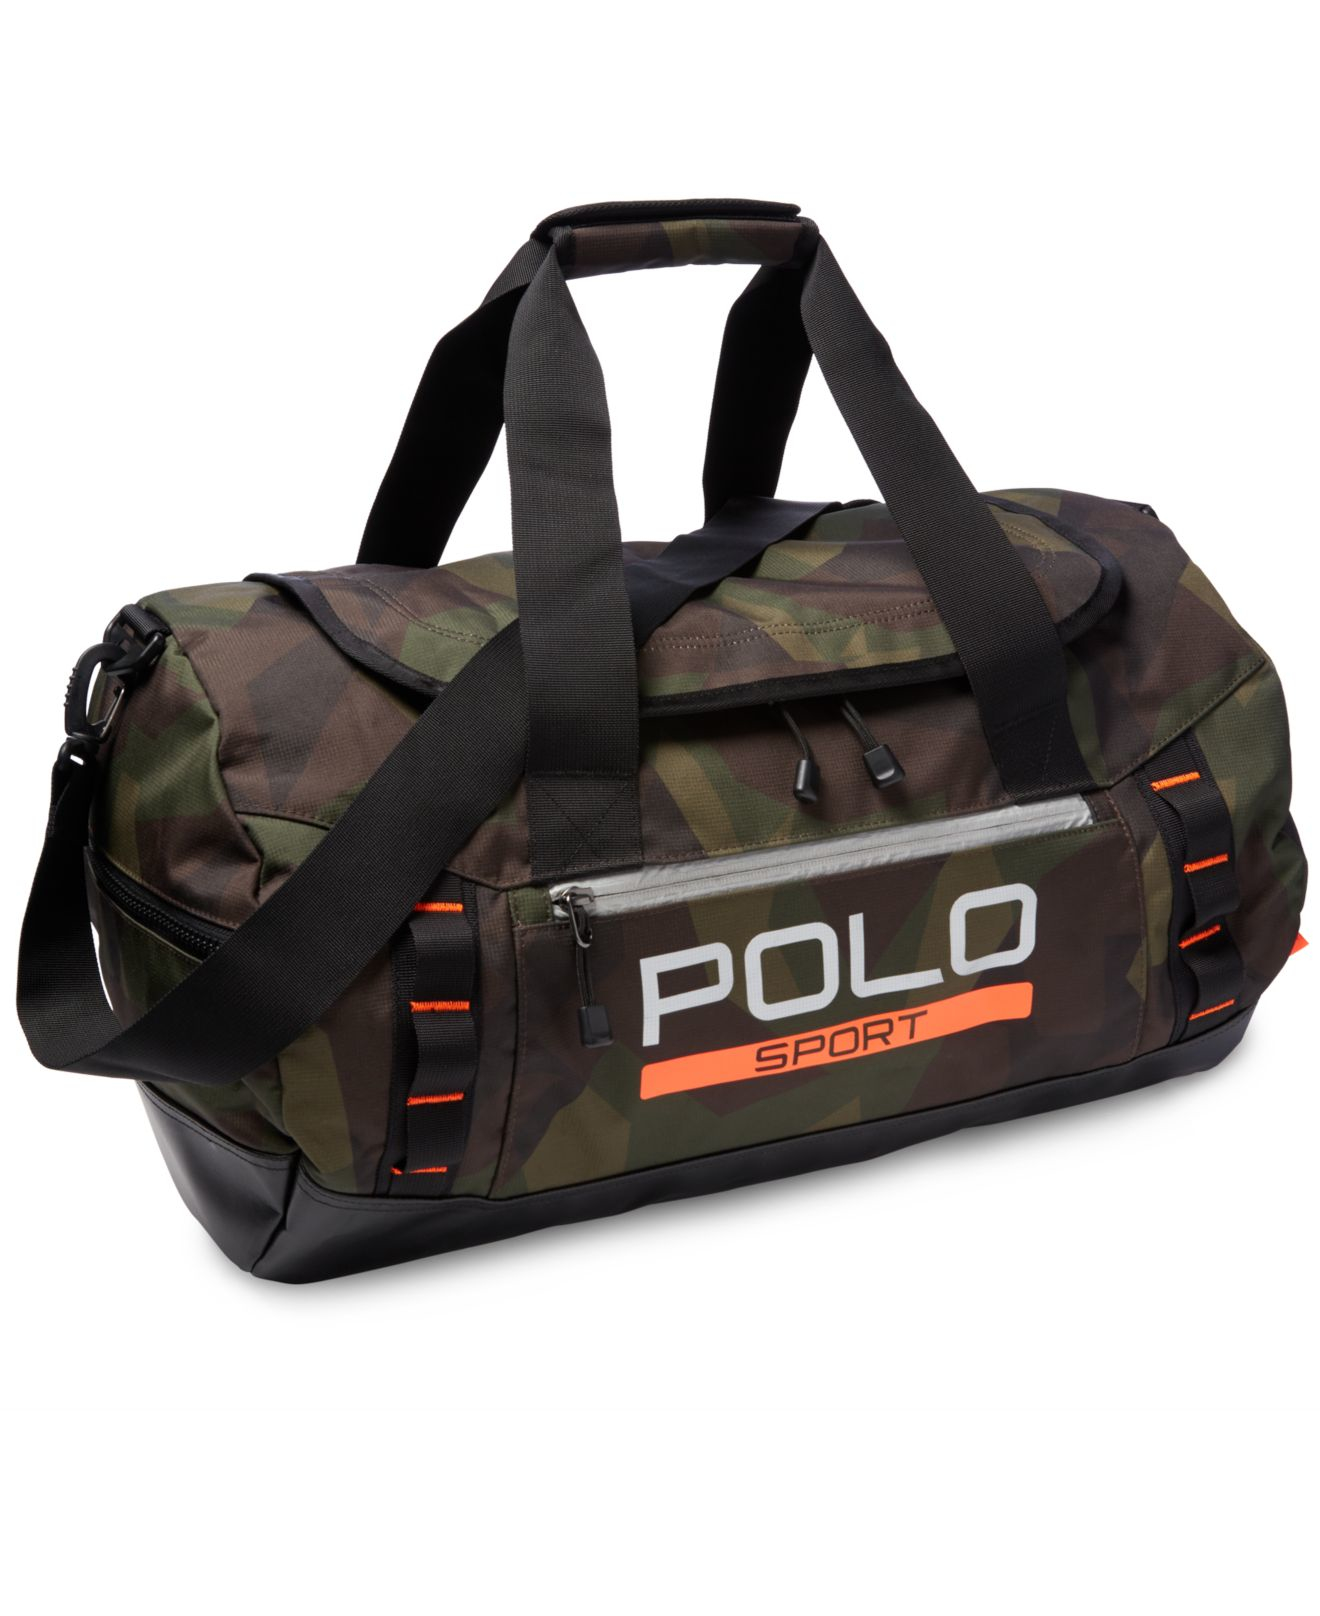 504d09c72786 ... discount lyst polo ralph lauren polo sport duffel bag in green for men  cf3ed 5a3dc